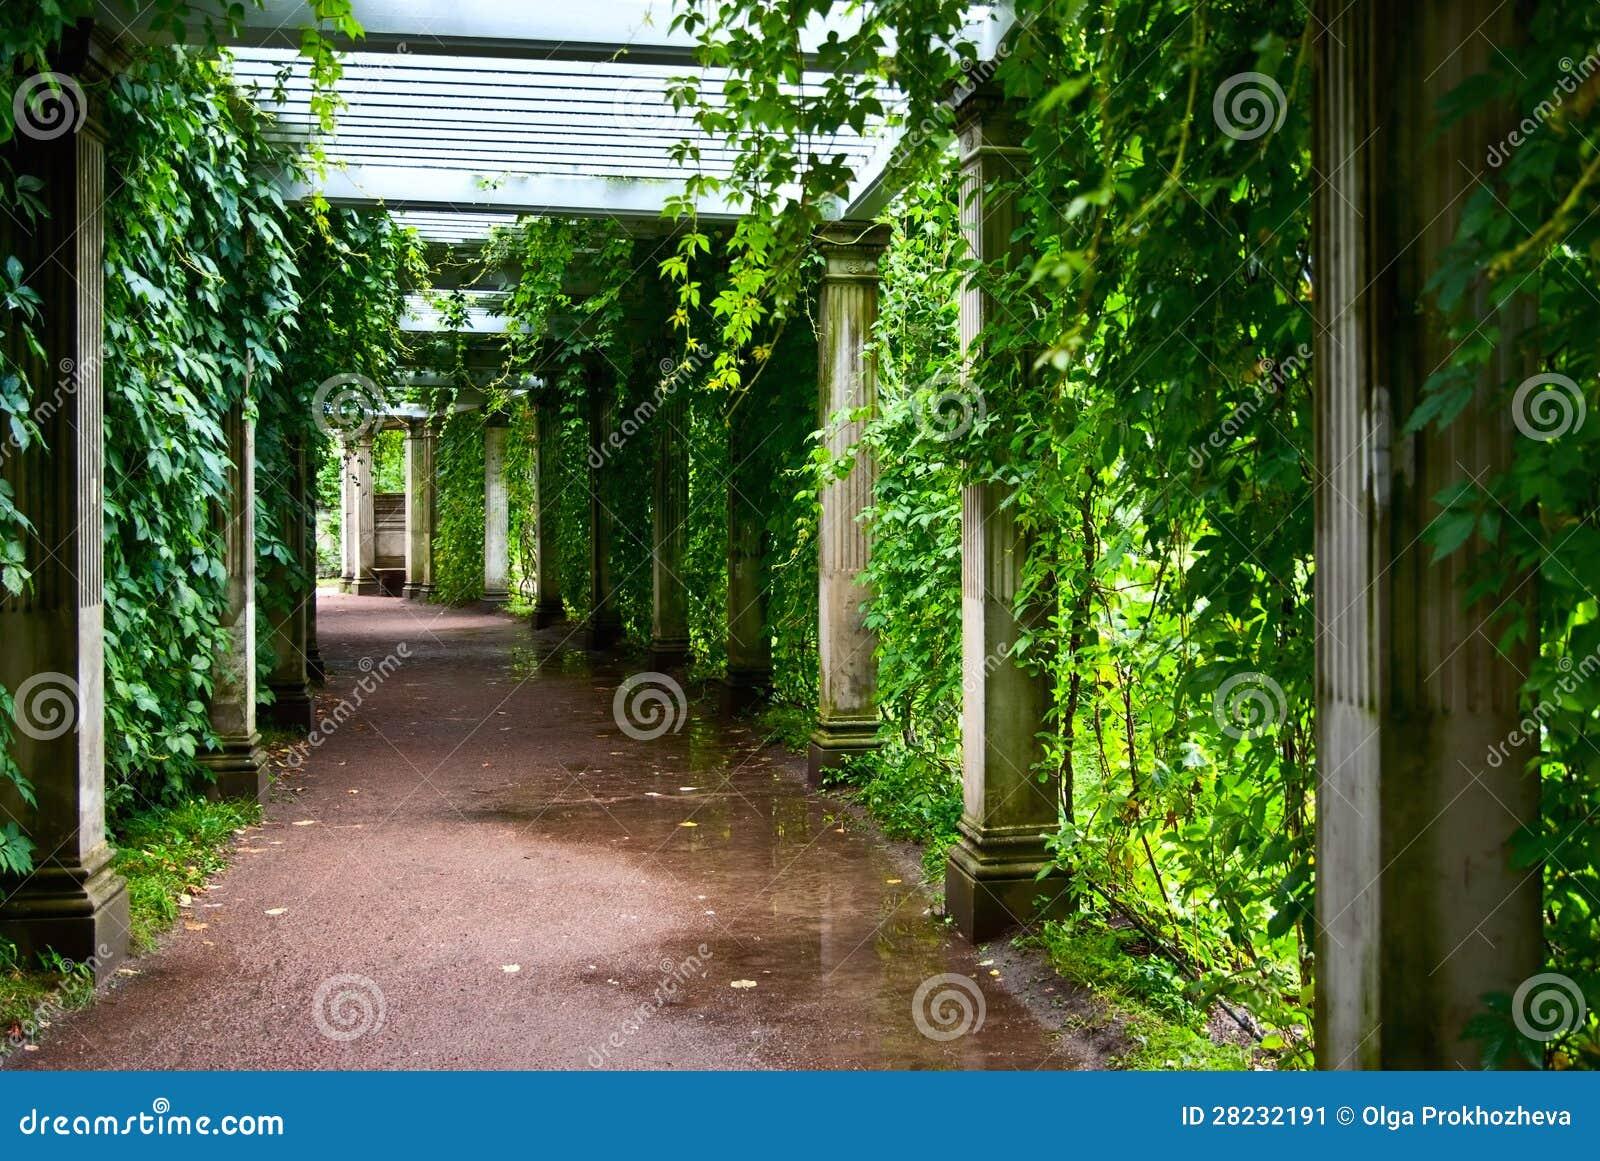 Pergola stockbild. bild von bank leuchte portal garten 28232191